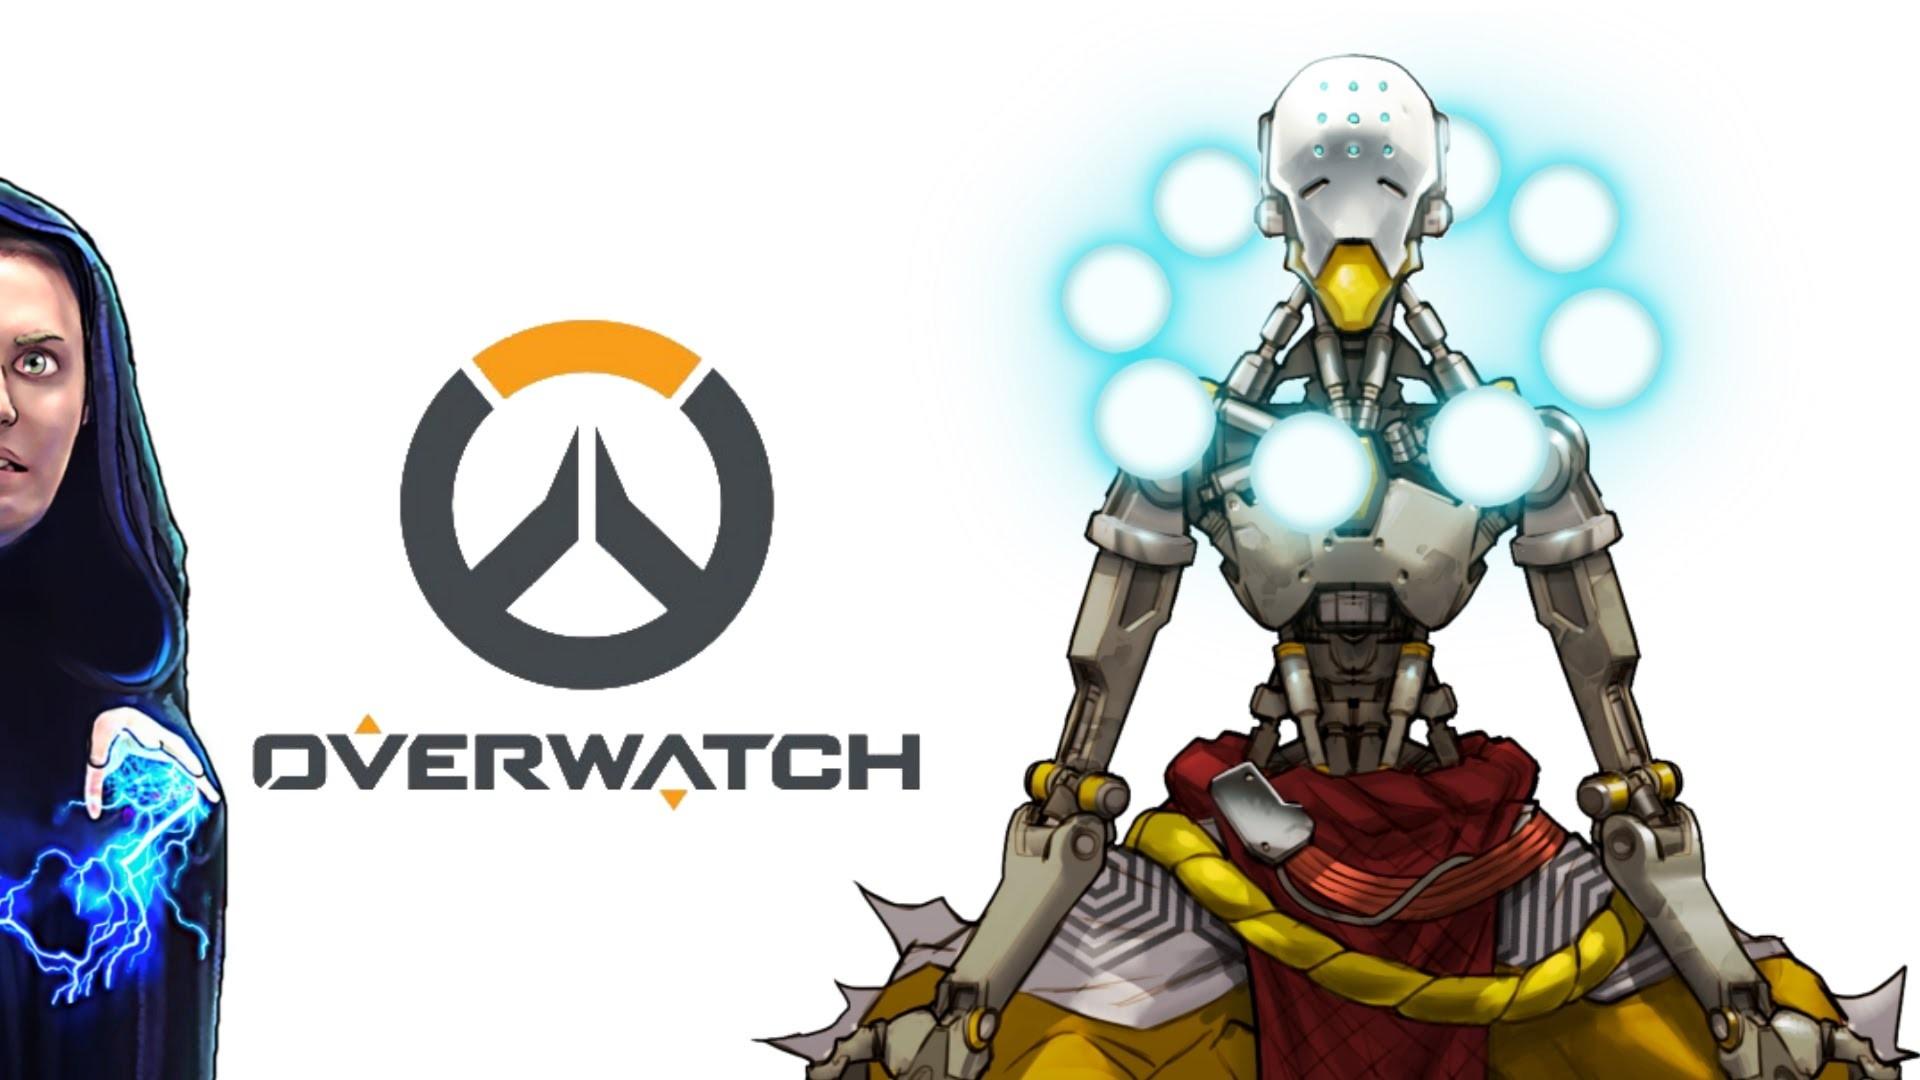 Overwatch Zenyatta Wallpaper Download Free Cool High Resolution